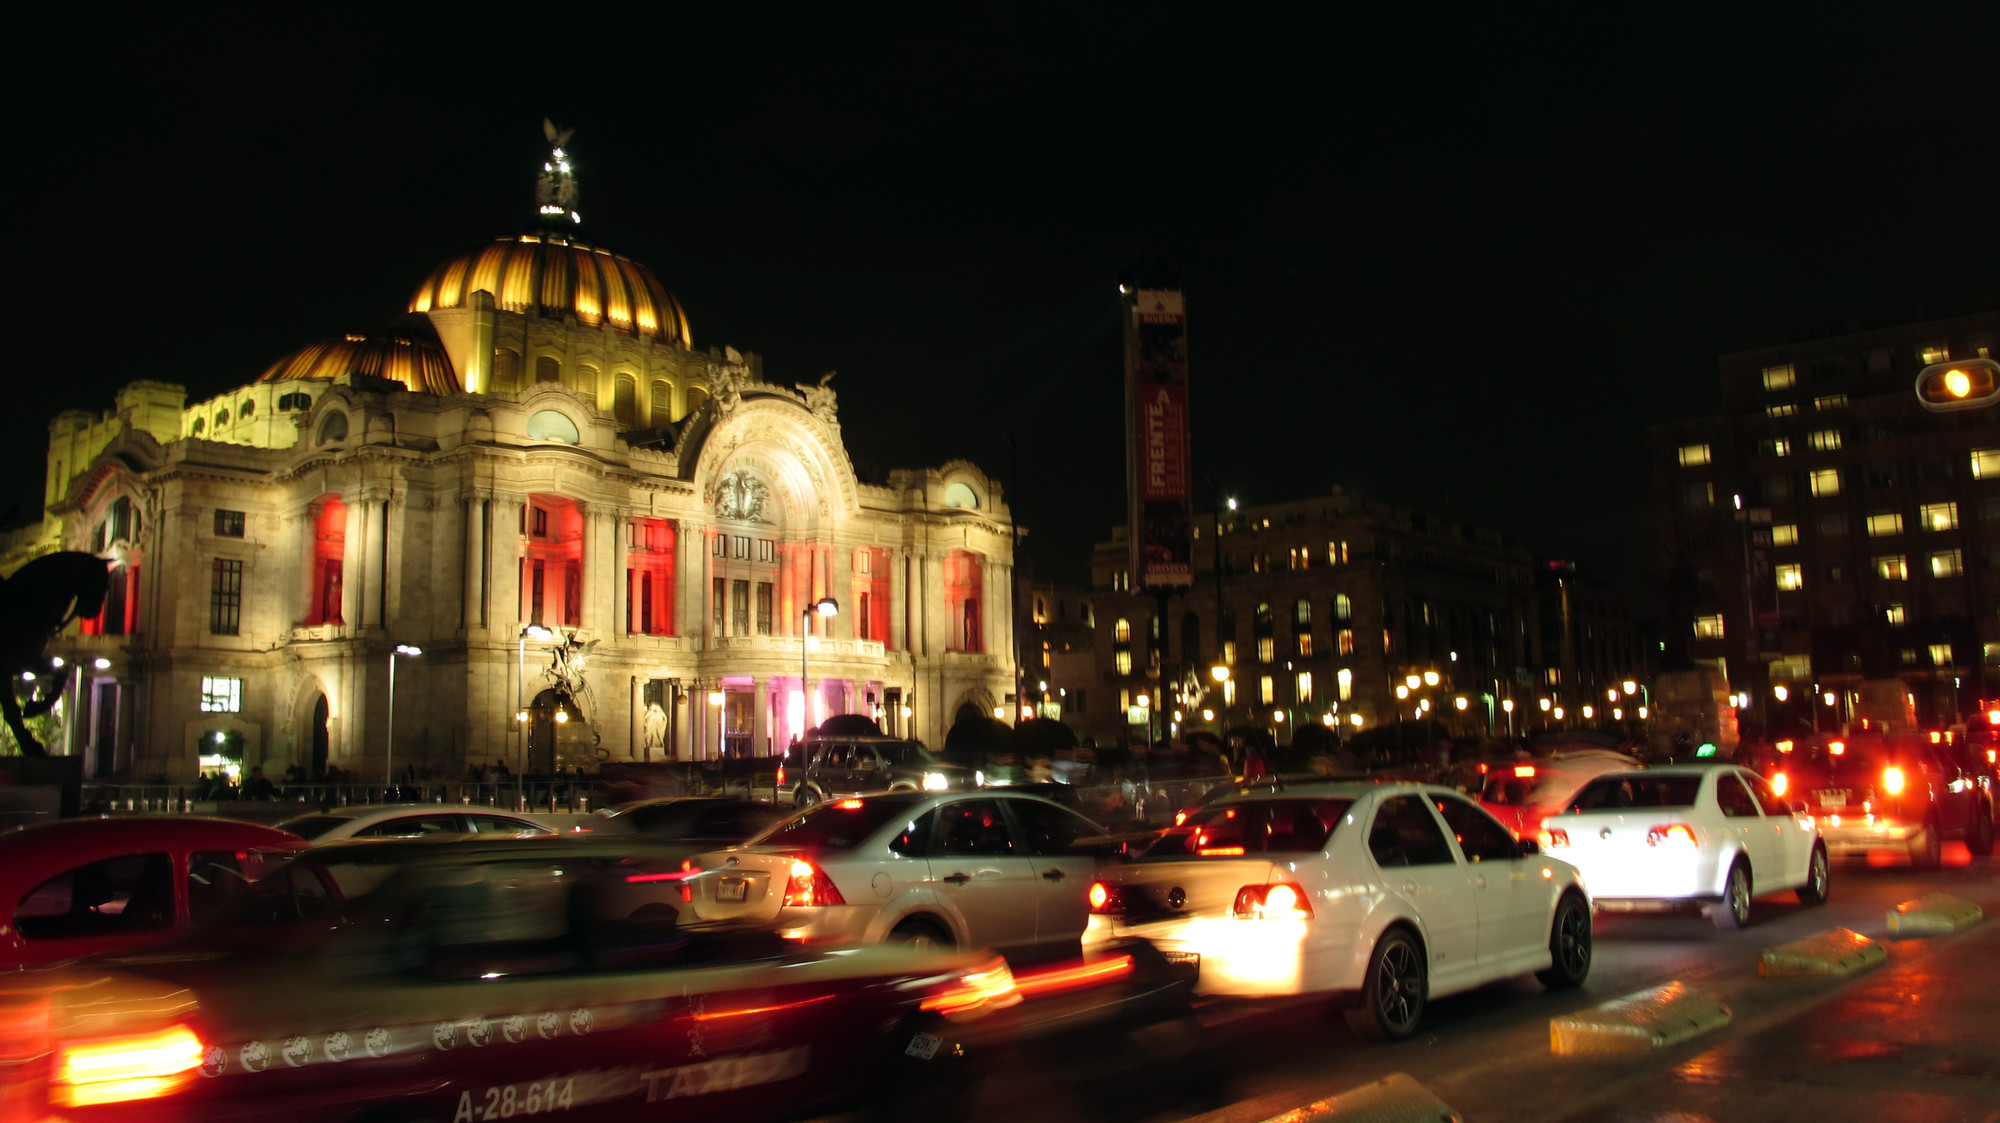 El Centro Histórico del D.F.: de lámparas de gas a luminarias LED, Cortesia de Daniela Arceo